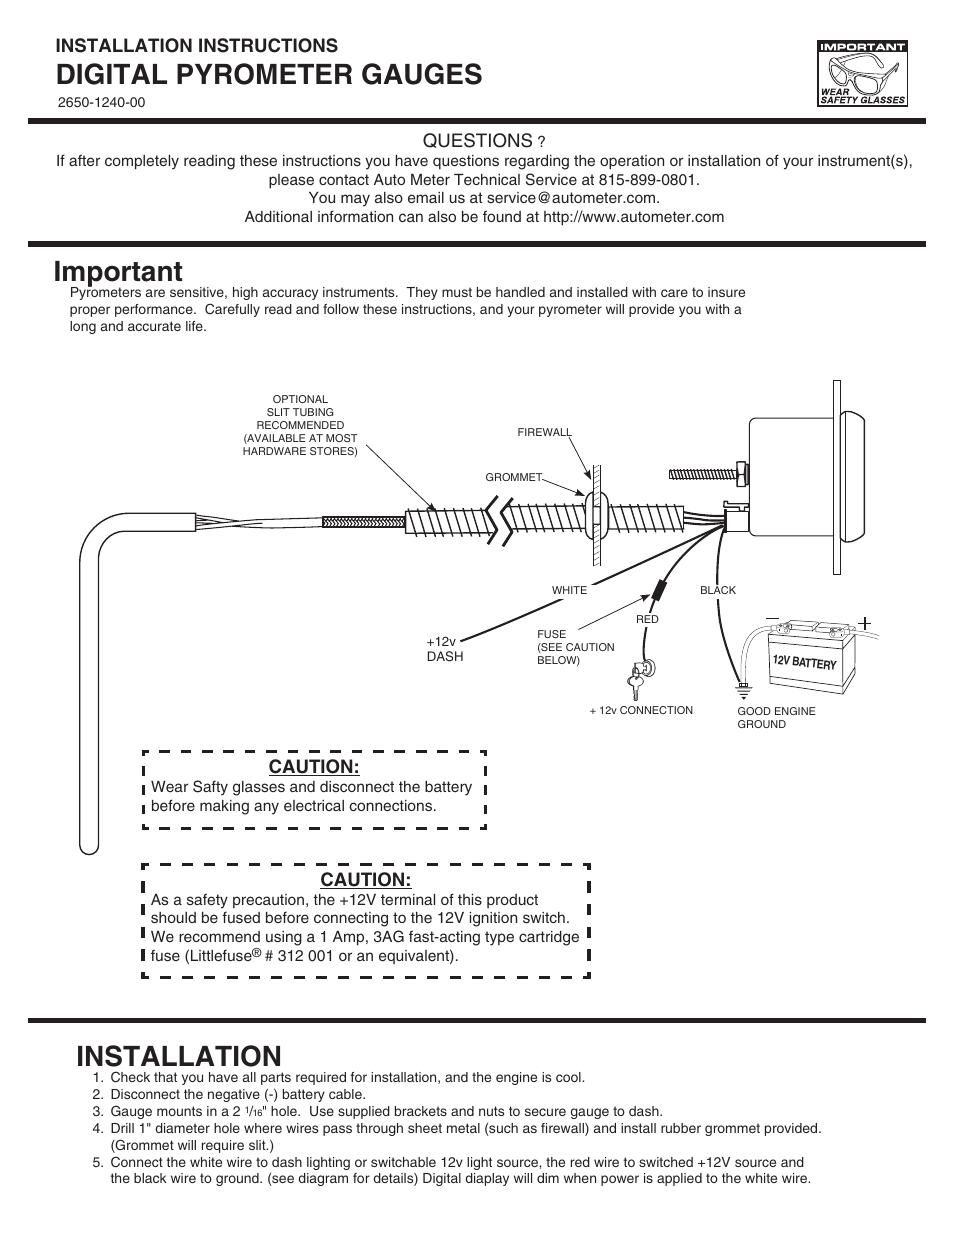 Autometer Cobalt Pyrometer Wiring Diagram